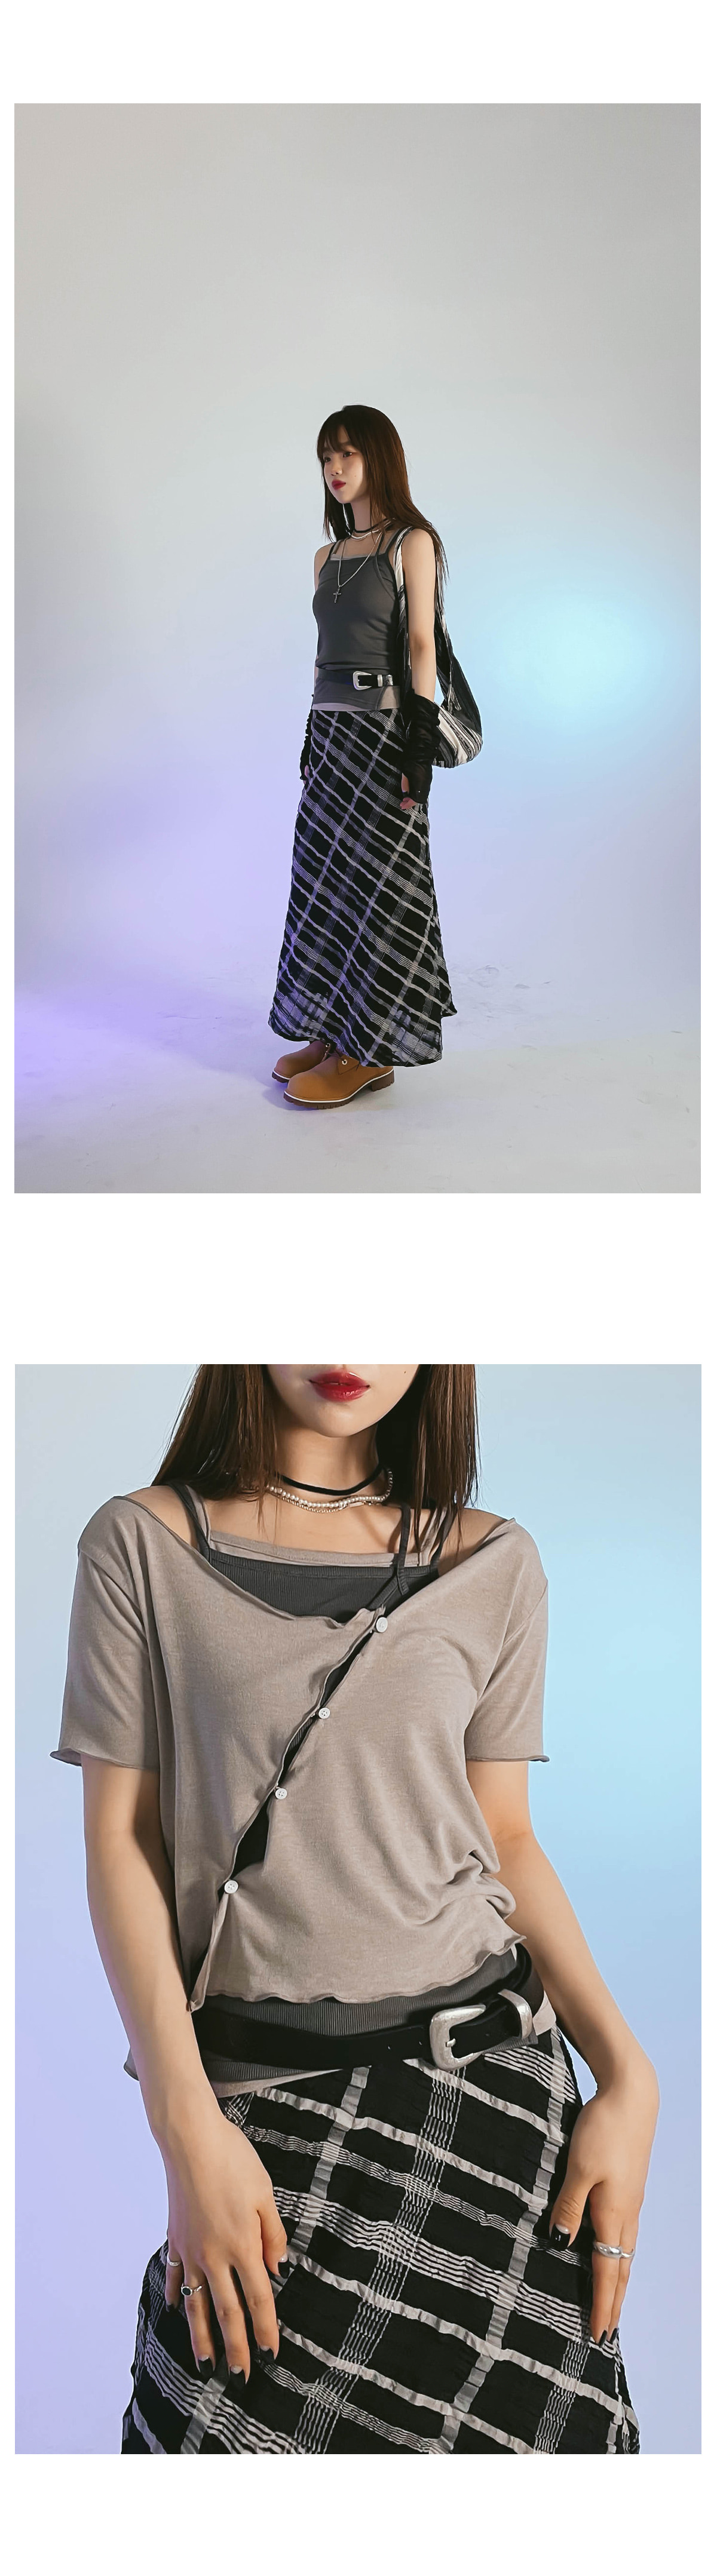 Unbald collar Sleeveless T-shirt